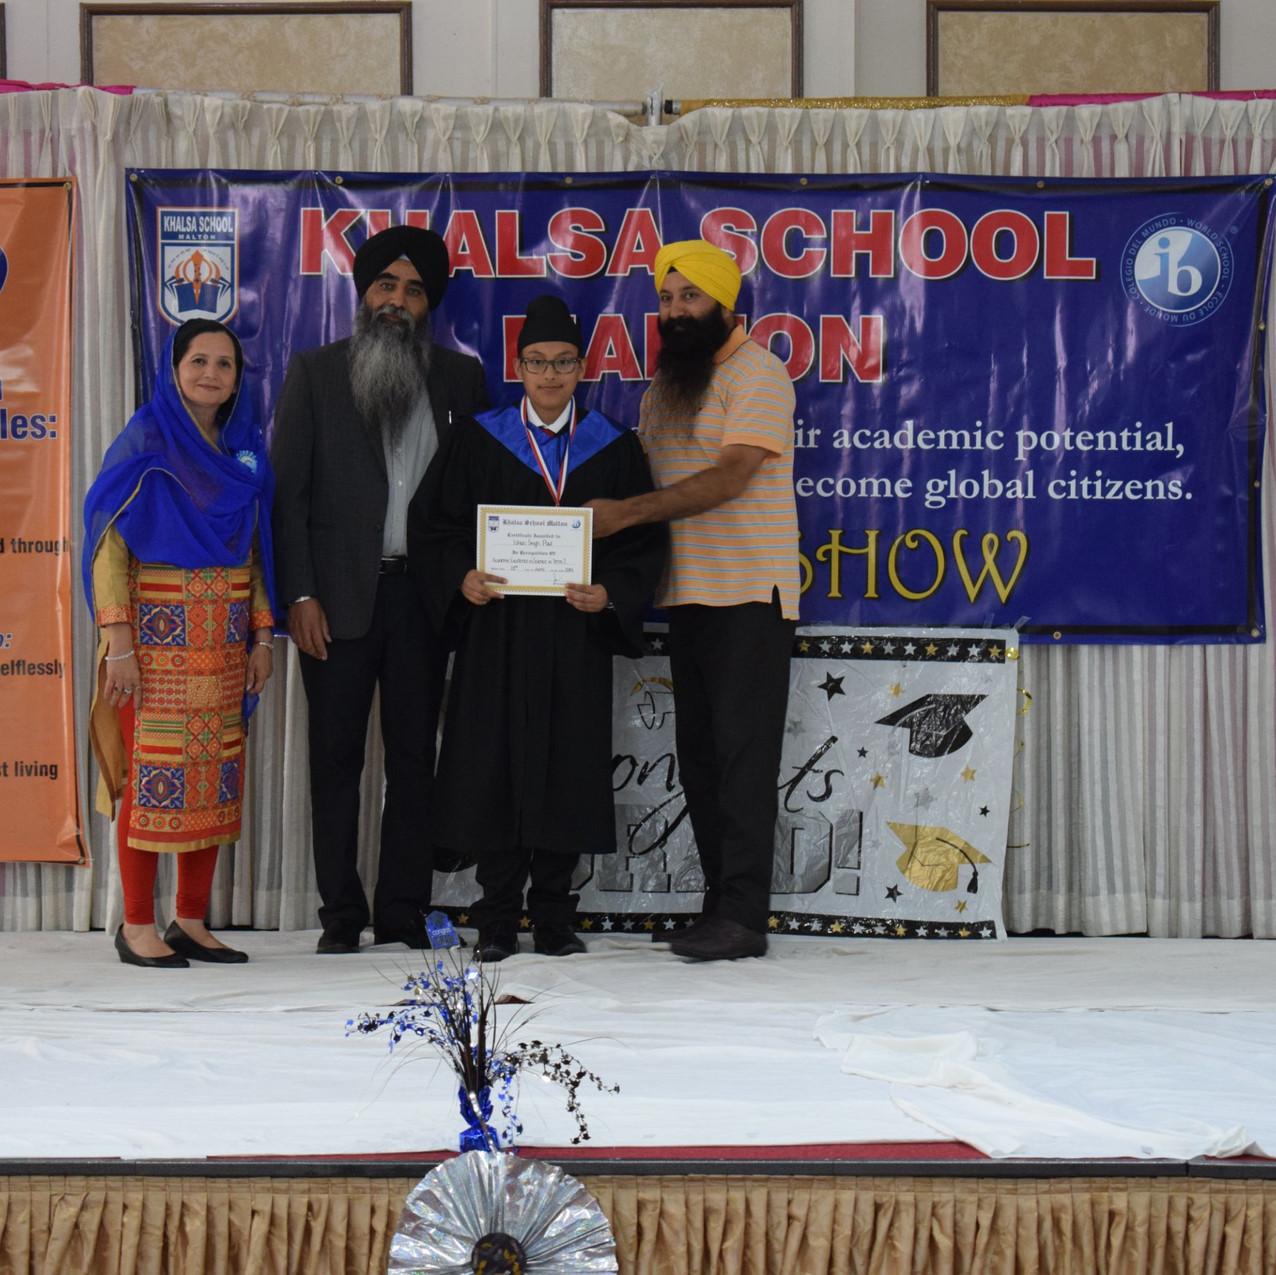 Khalsa School Malton Graduation Da02